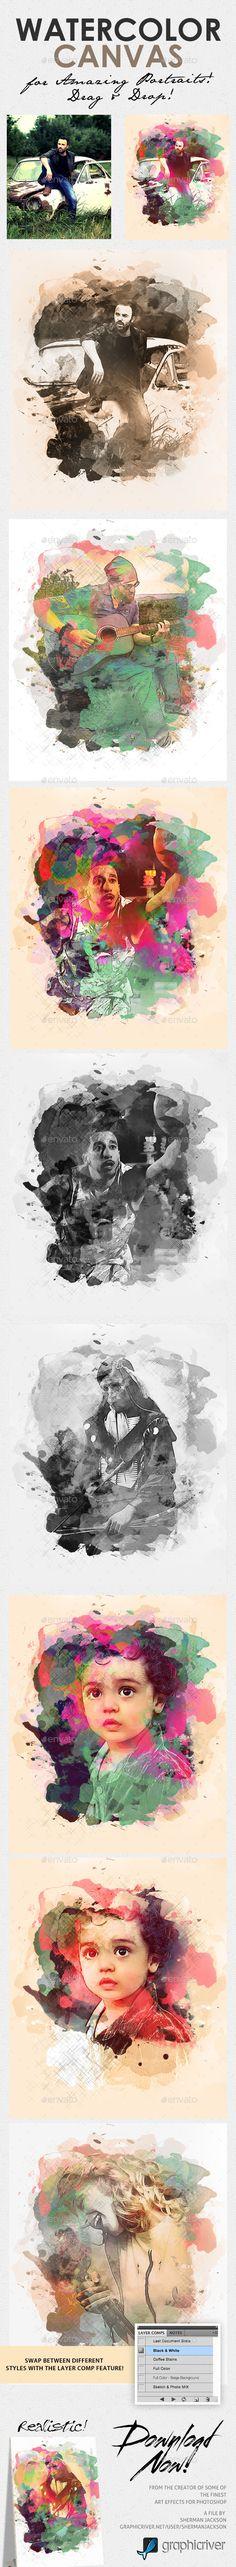 Watercolour Canvas - Photo to Art